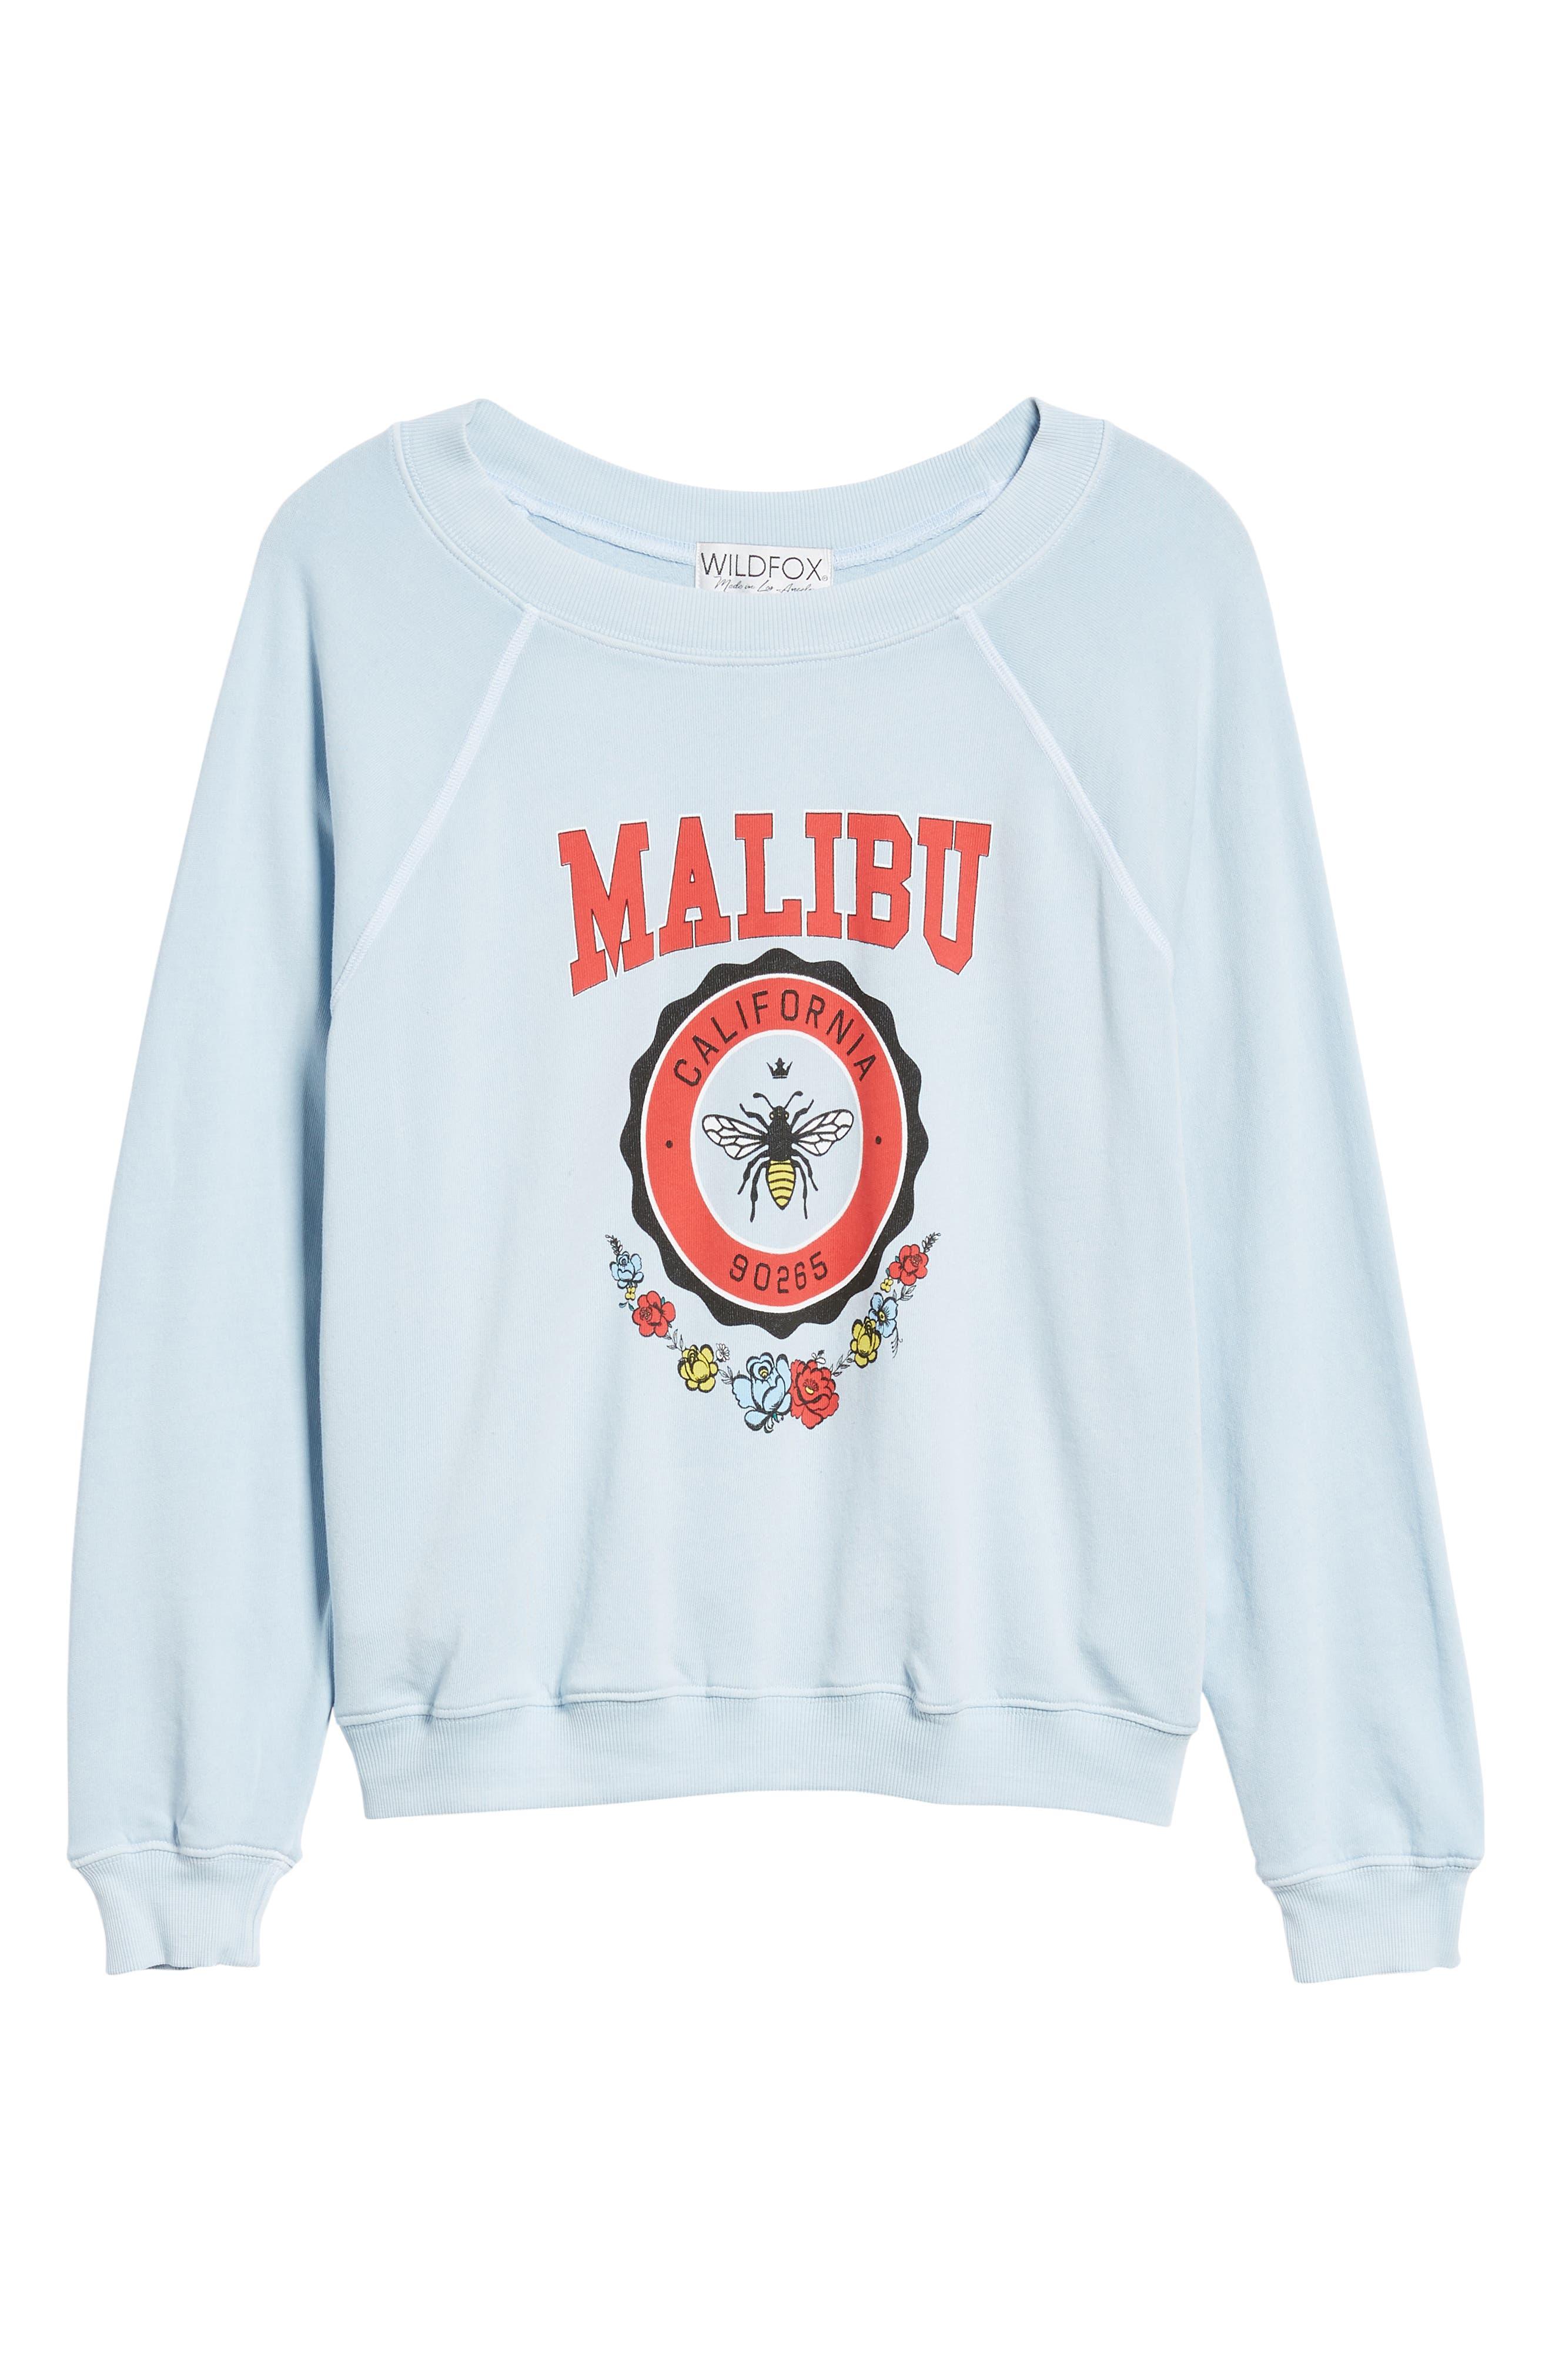 Malibu Crest Sommers Sweatshirt,                             Alternate thumbnail 6, color,                             400